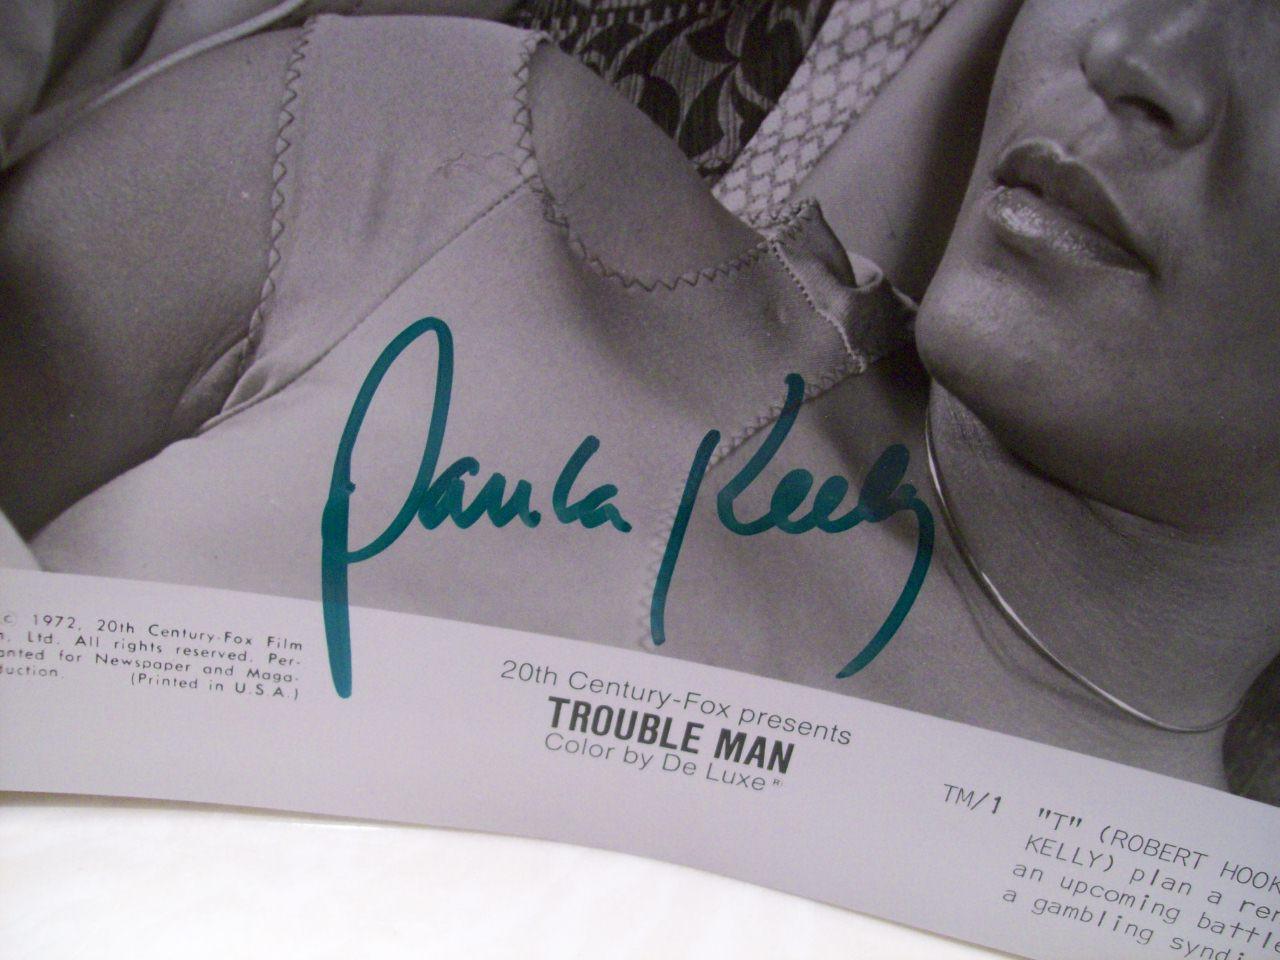 Hooks, Robert Paula Kelly Photo Signed Autograph Trouble Man 1972